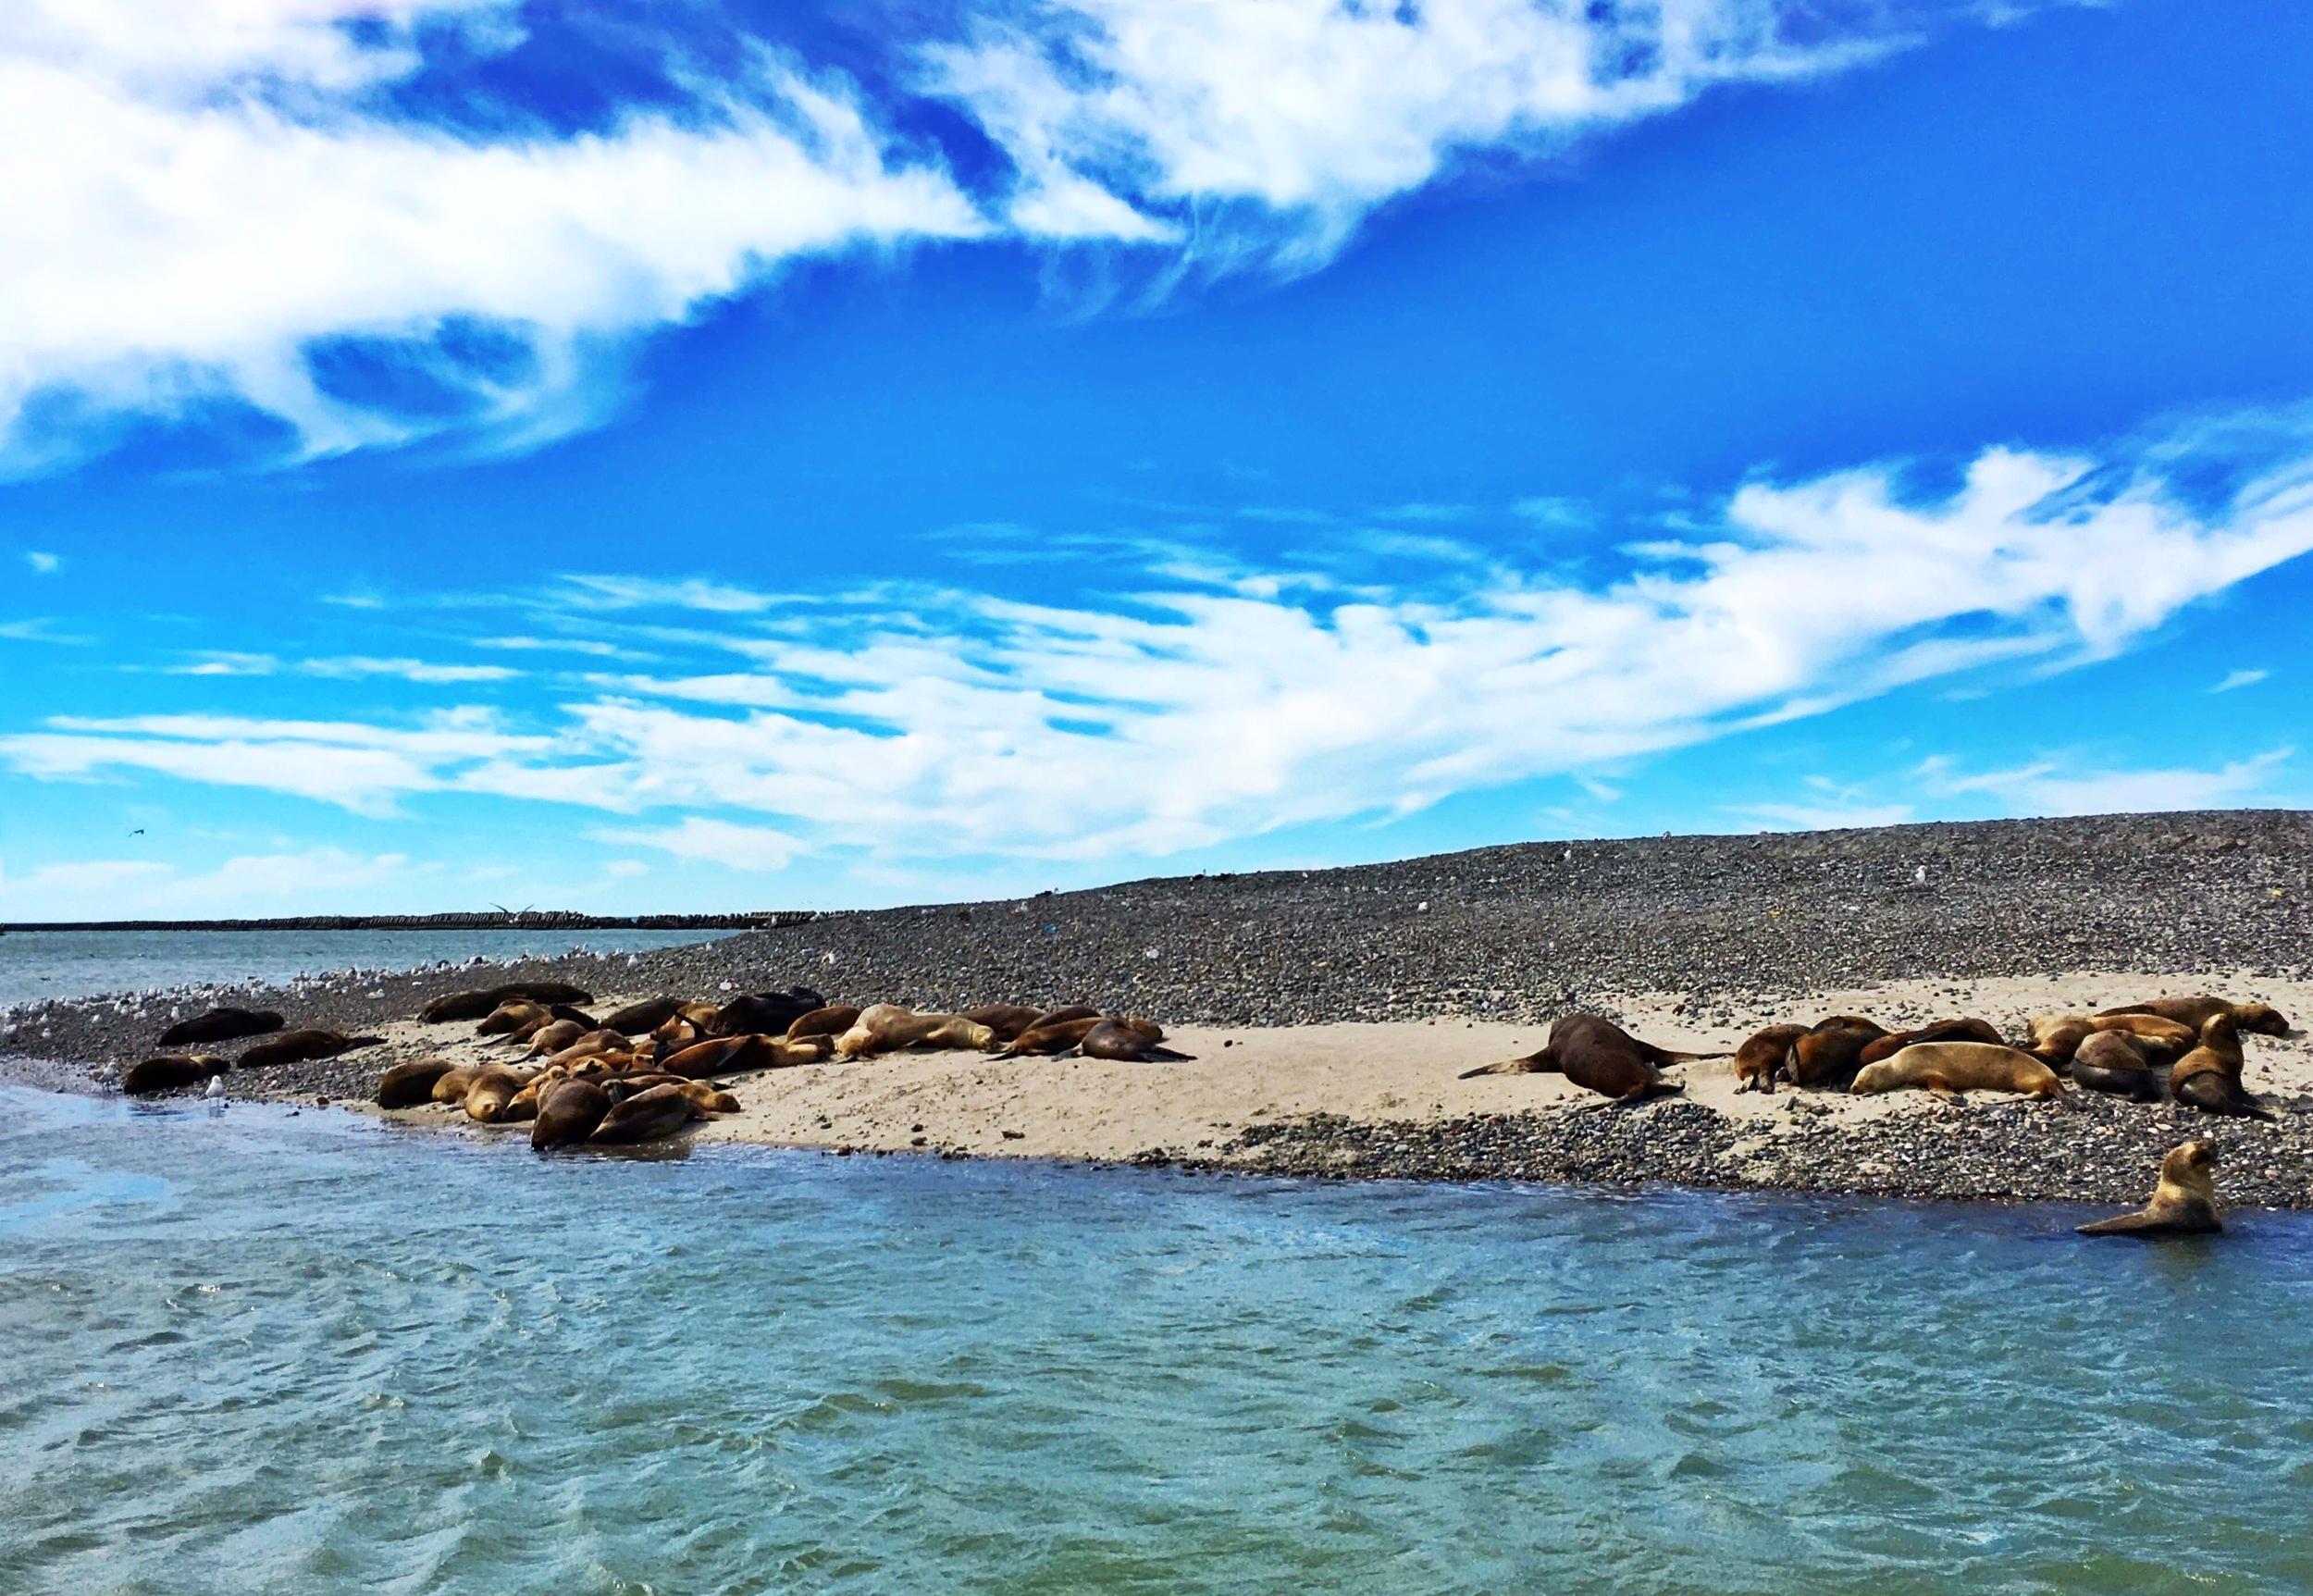 sea-lions-playa-union-rawson-argentina-ochristine